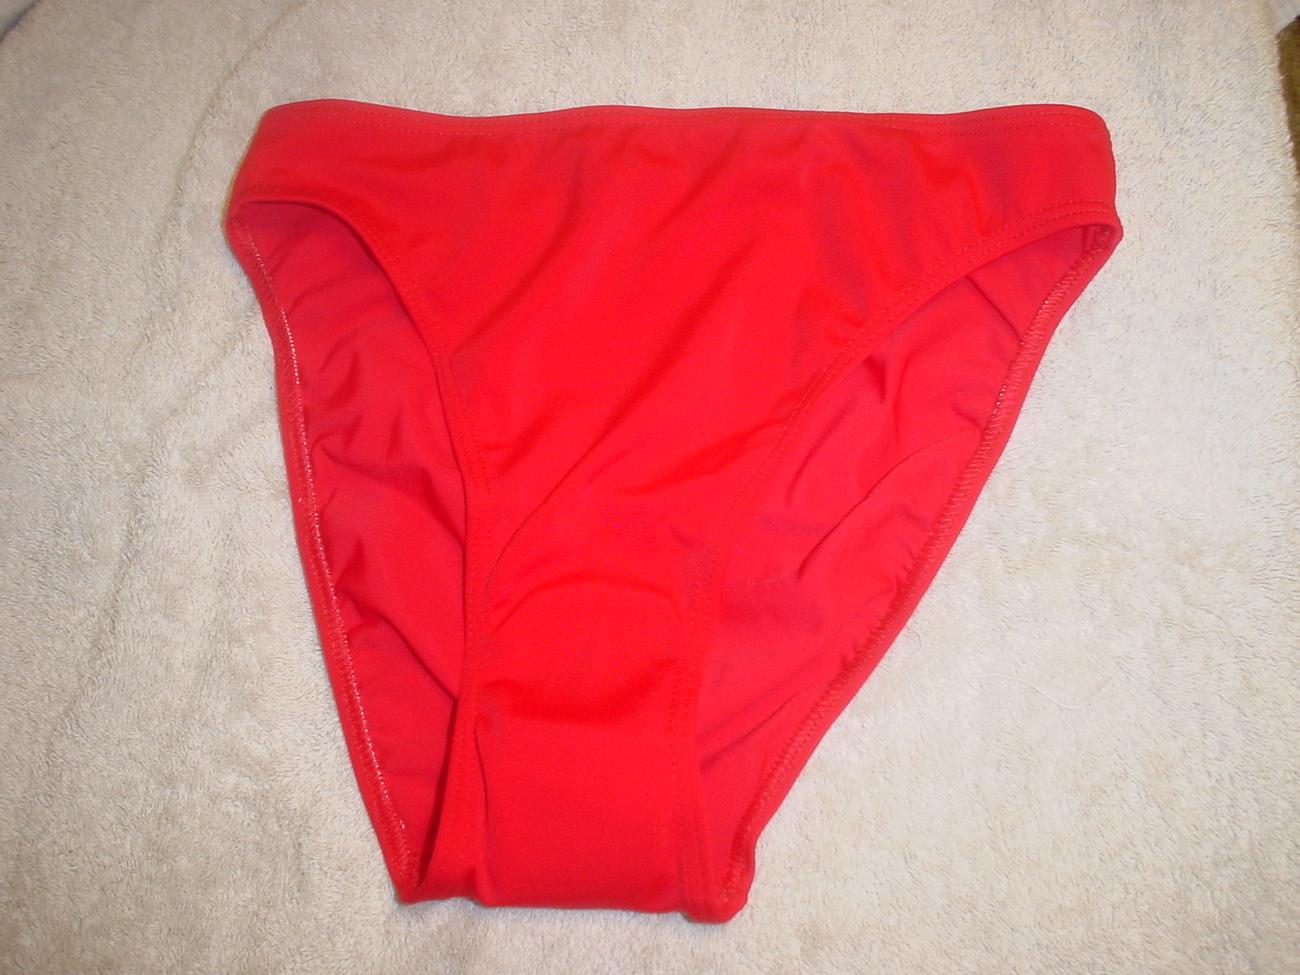 Club Med Tanki Bikini Red/White/Navy Size XSmall NWT